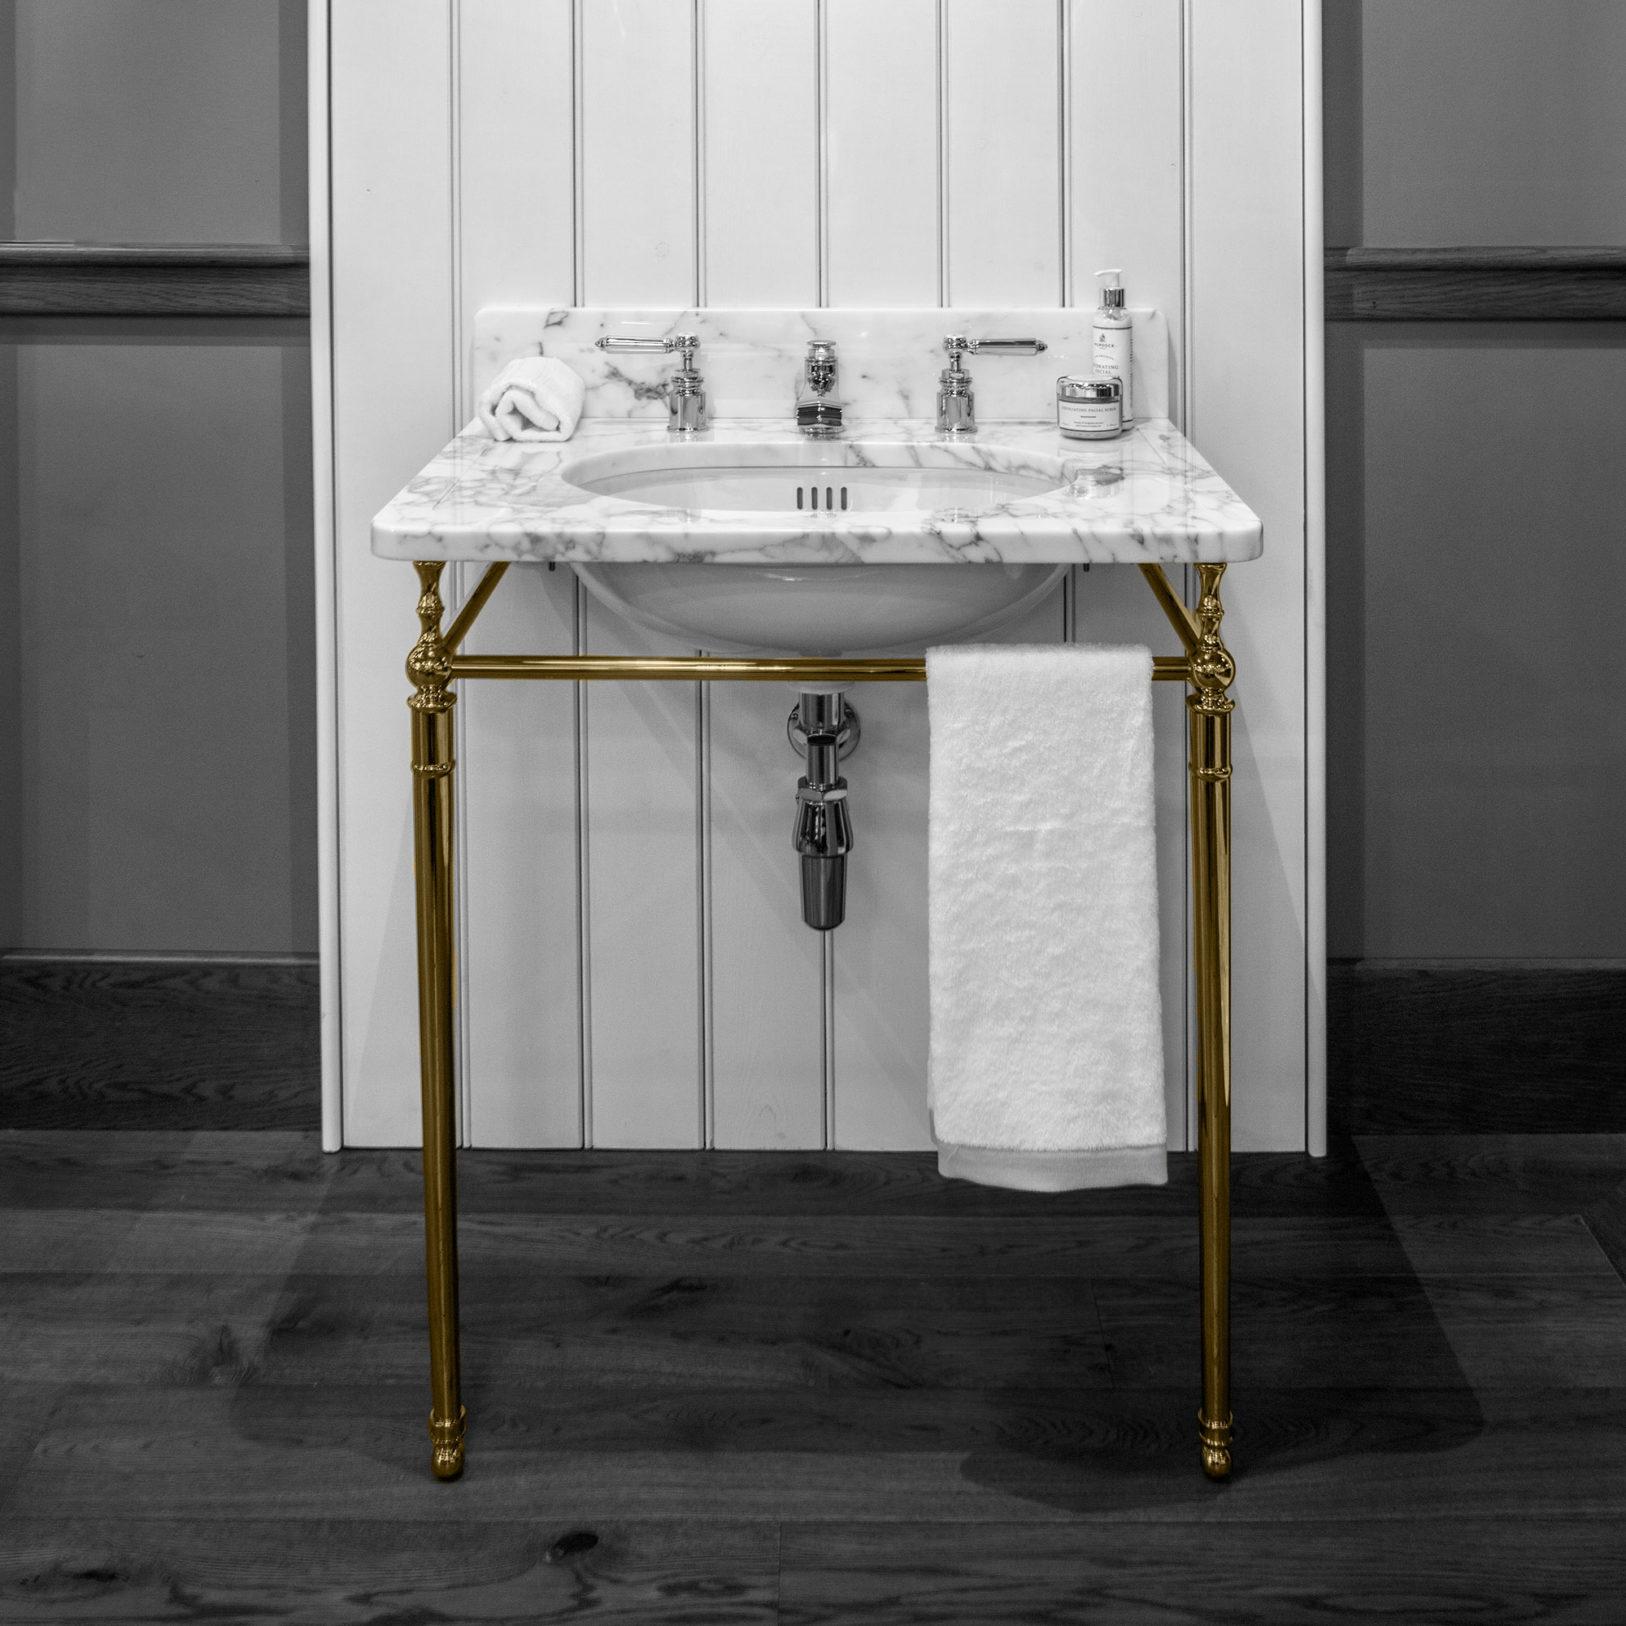 Single Locky Basin Stand in brass finish